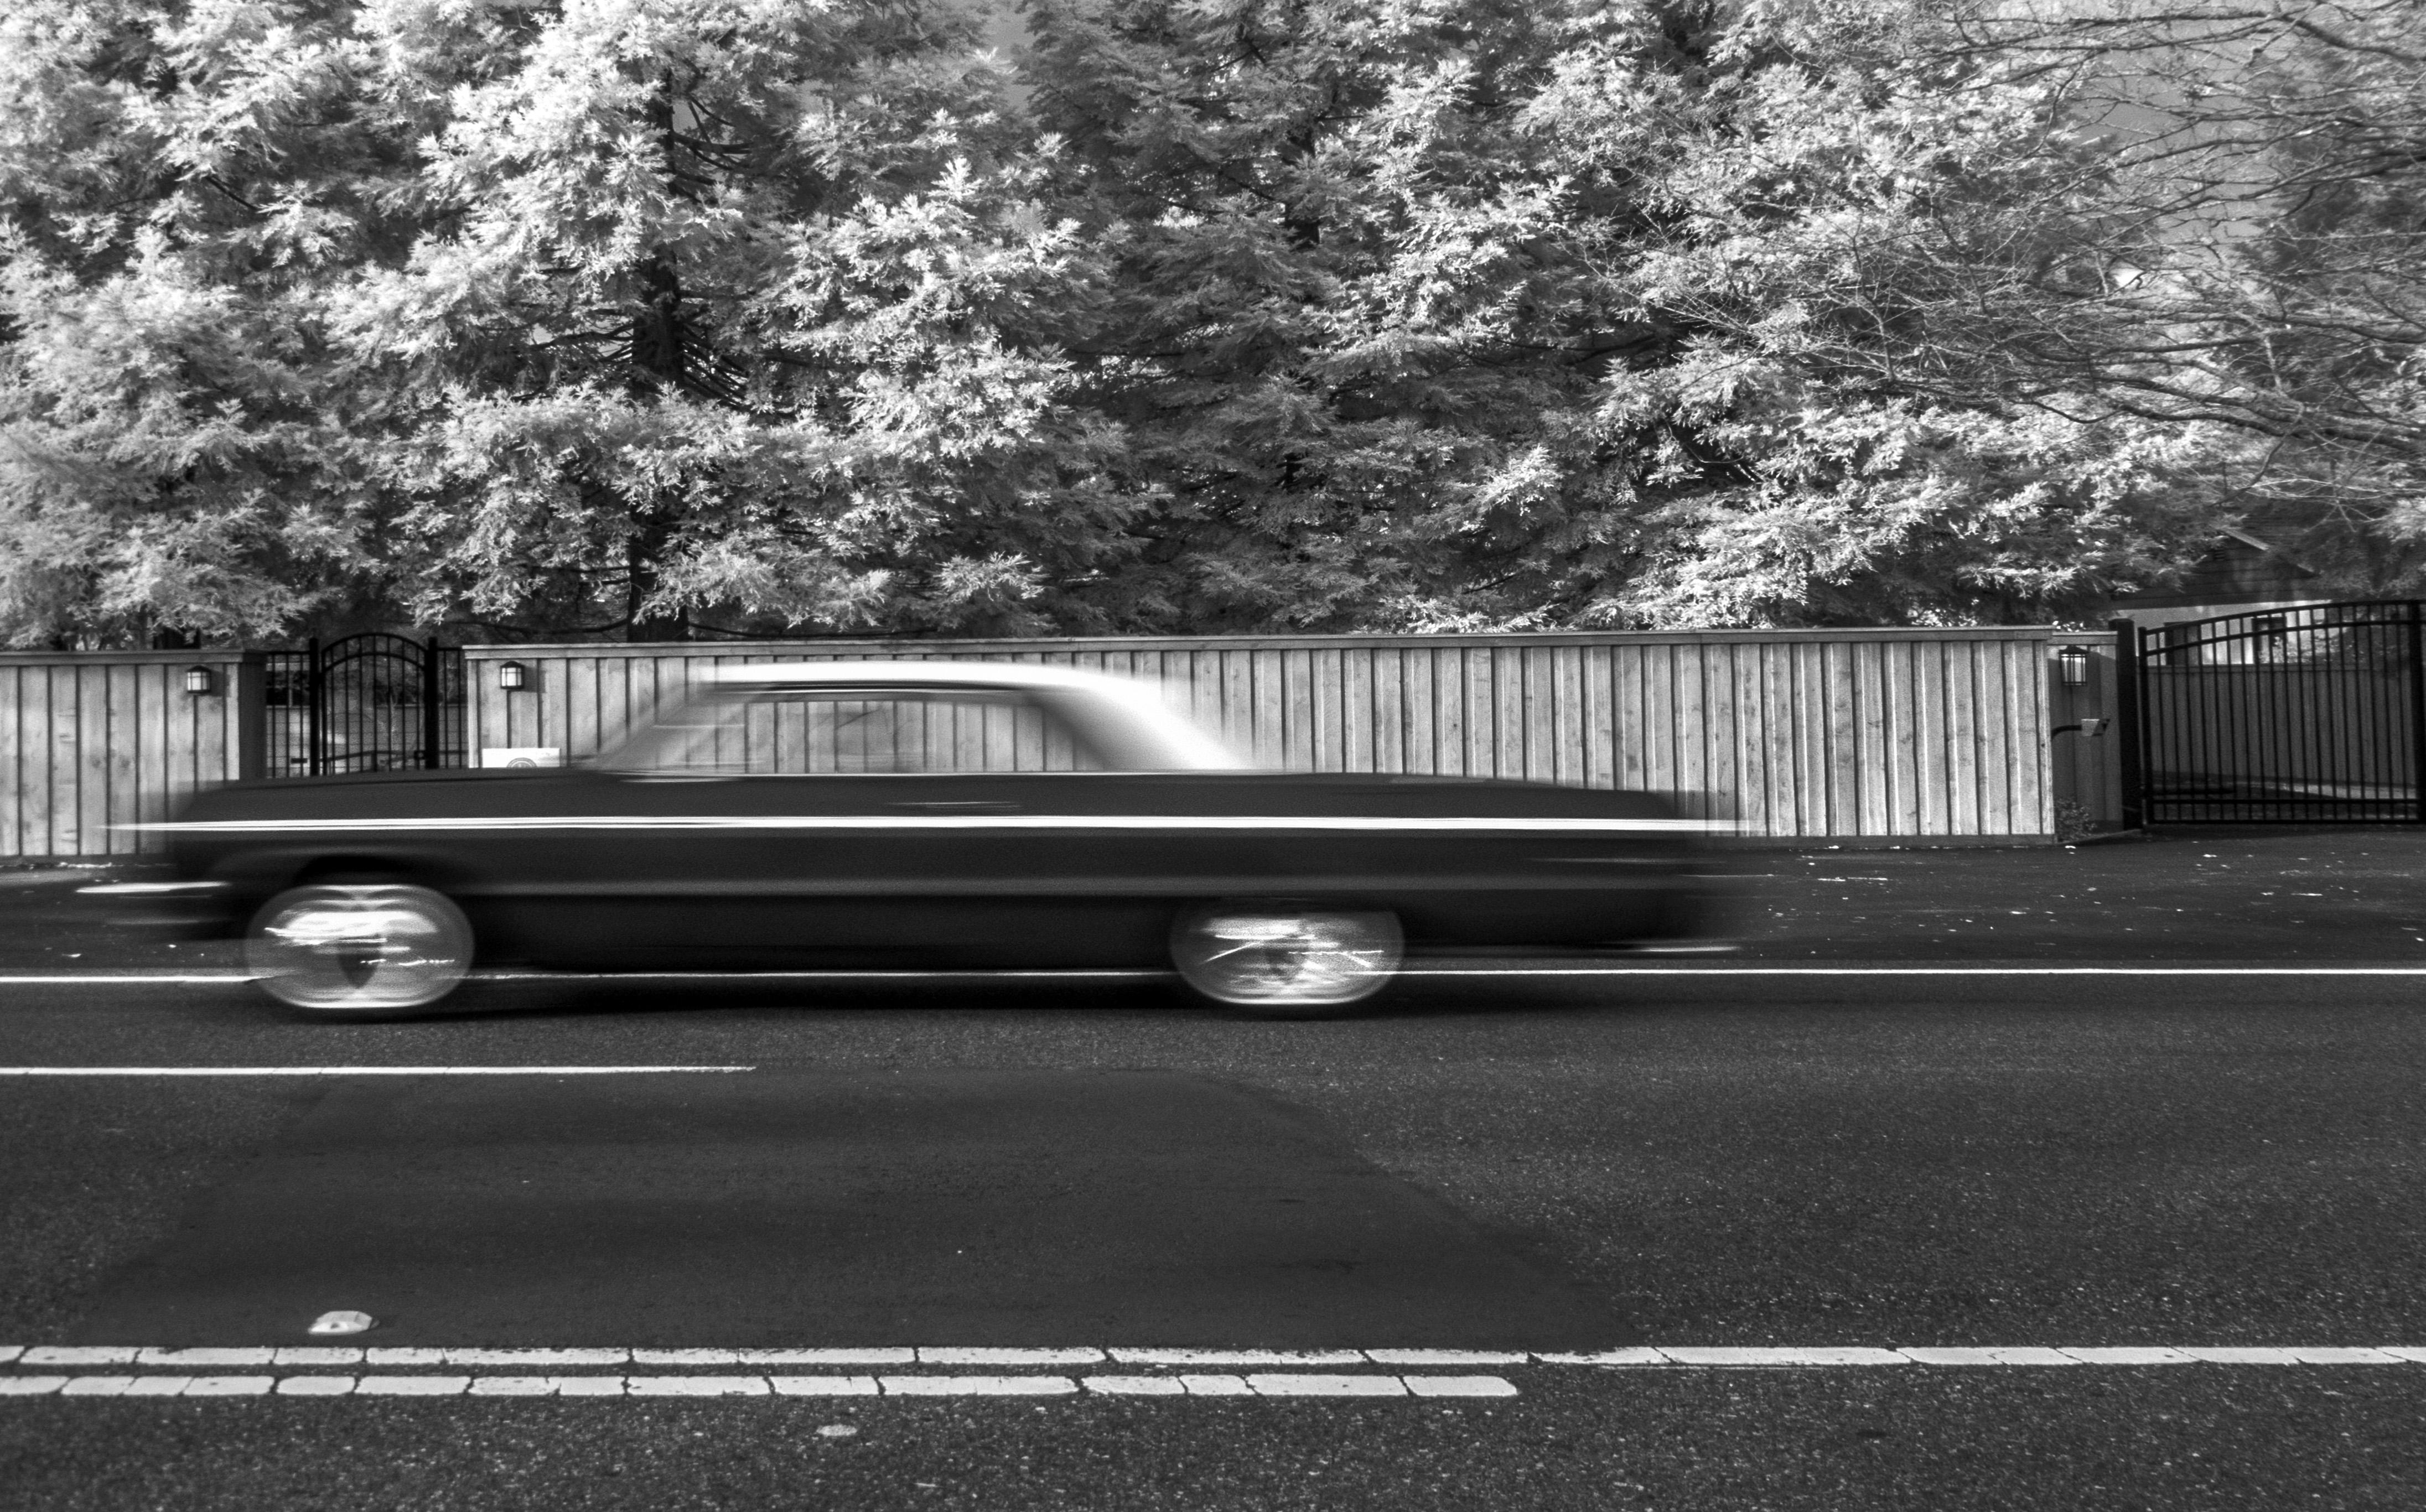 photography luxury monochrome automobile vehicle en car white classic land images and blur sacramento free make photo black chevrolet road transport